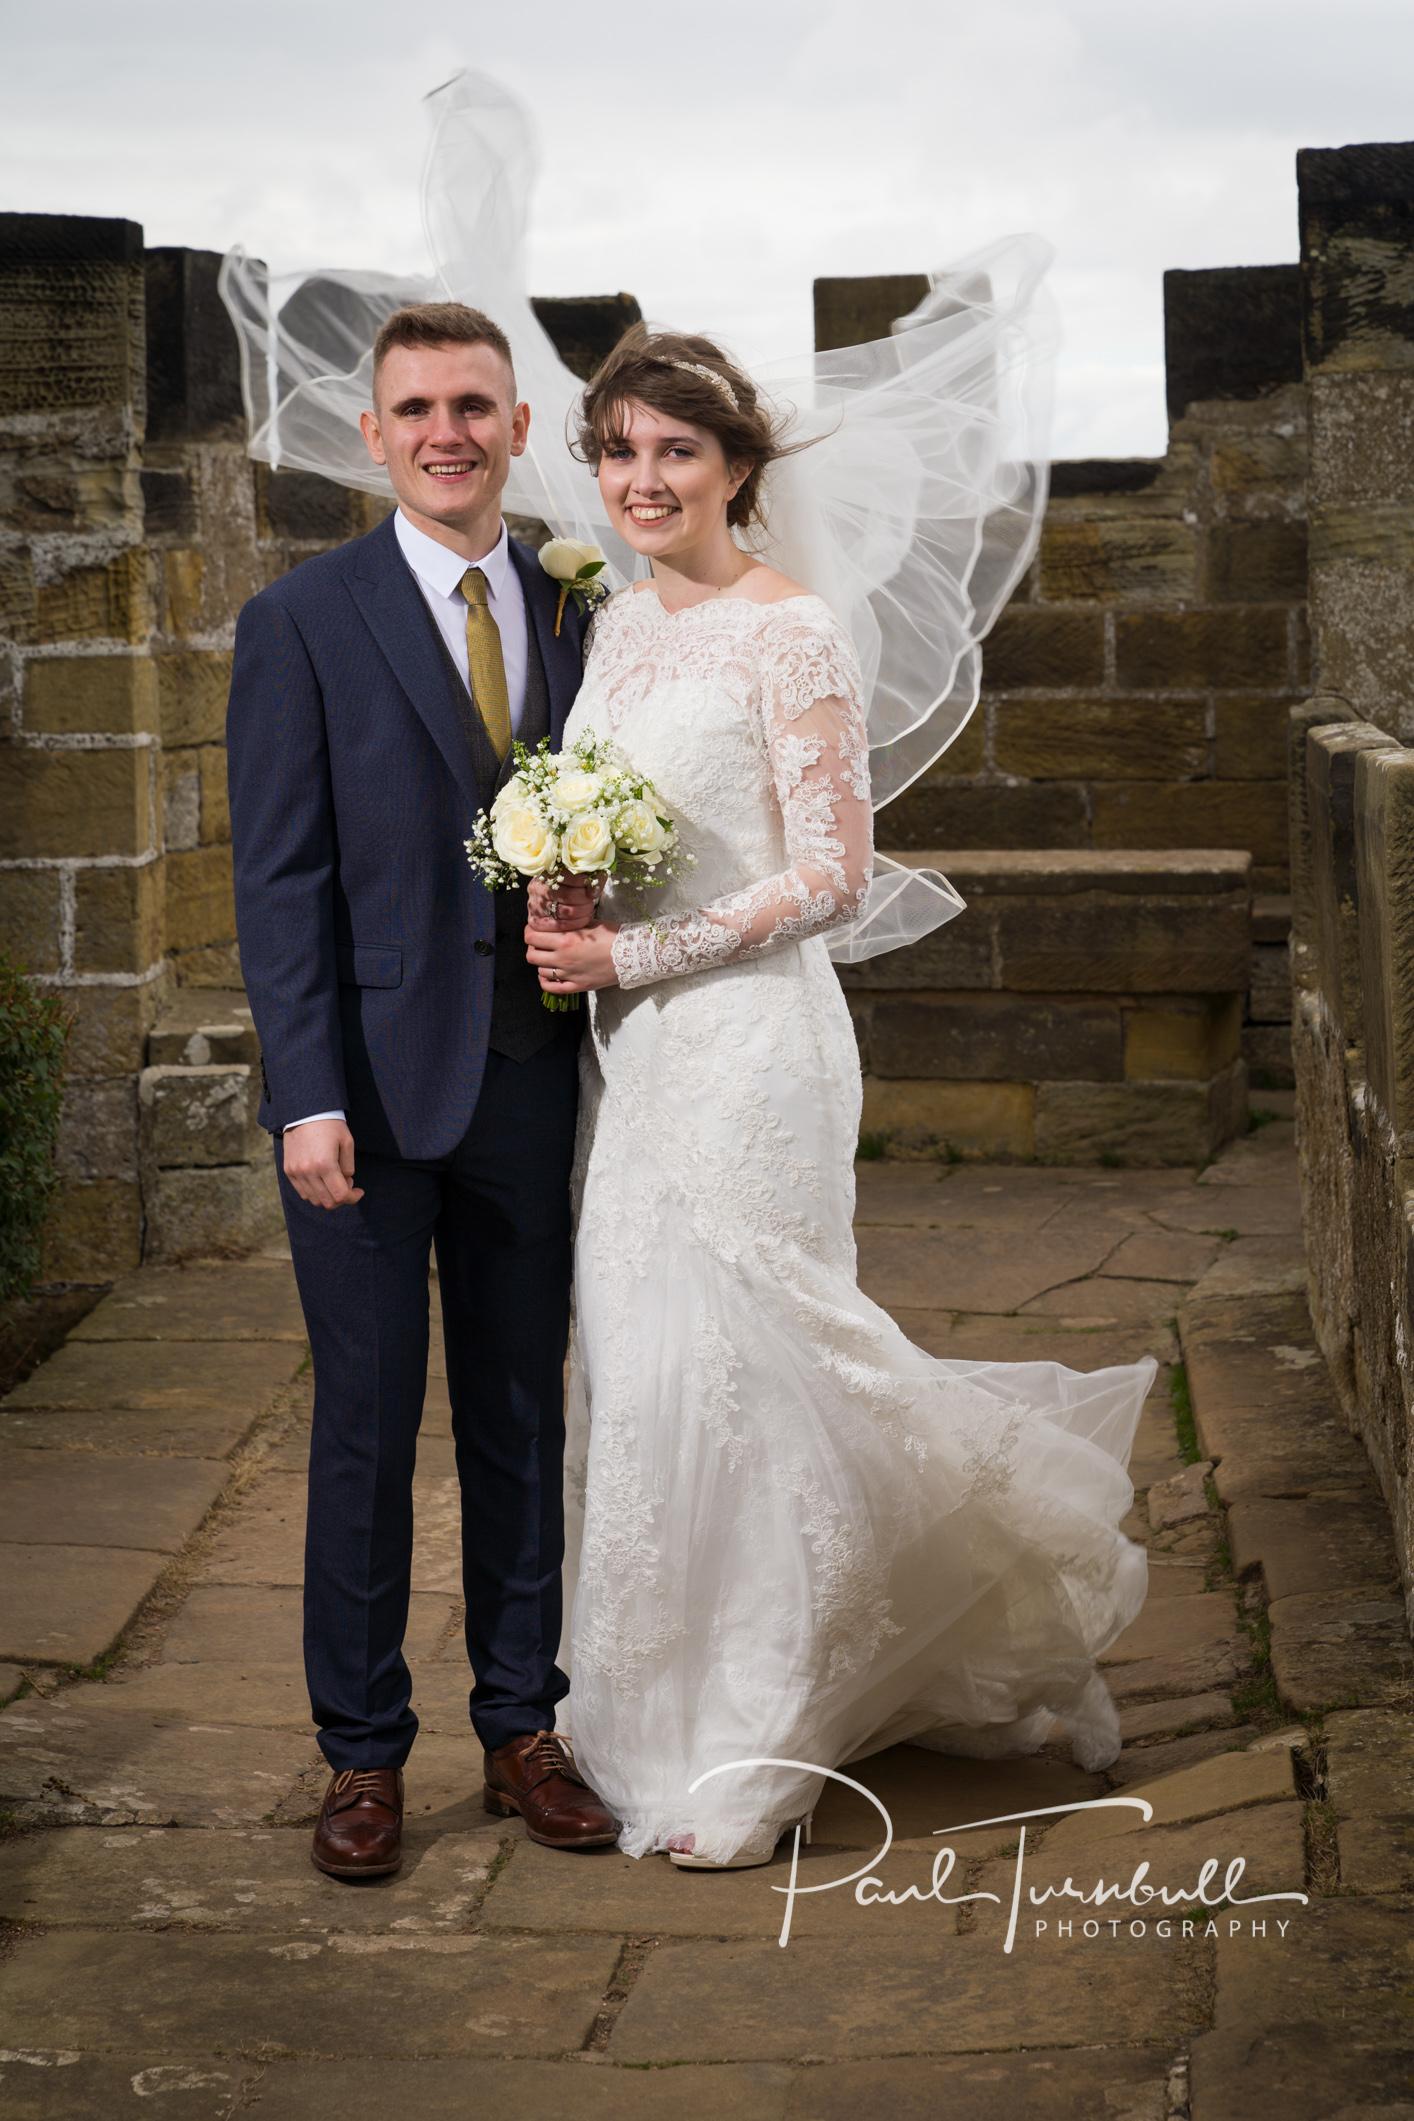 Windy wedding day at Raven Hall, Ravenscar